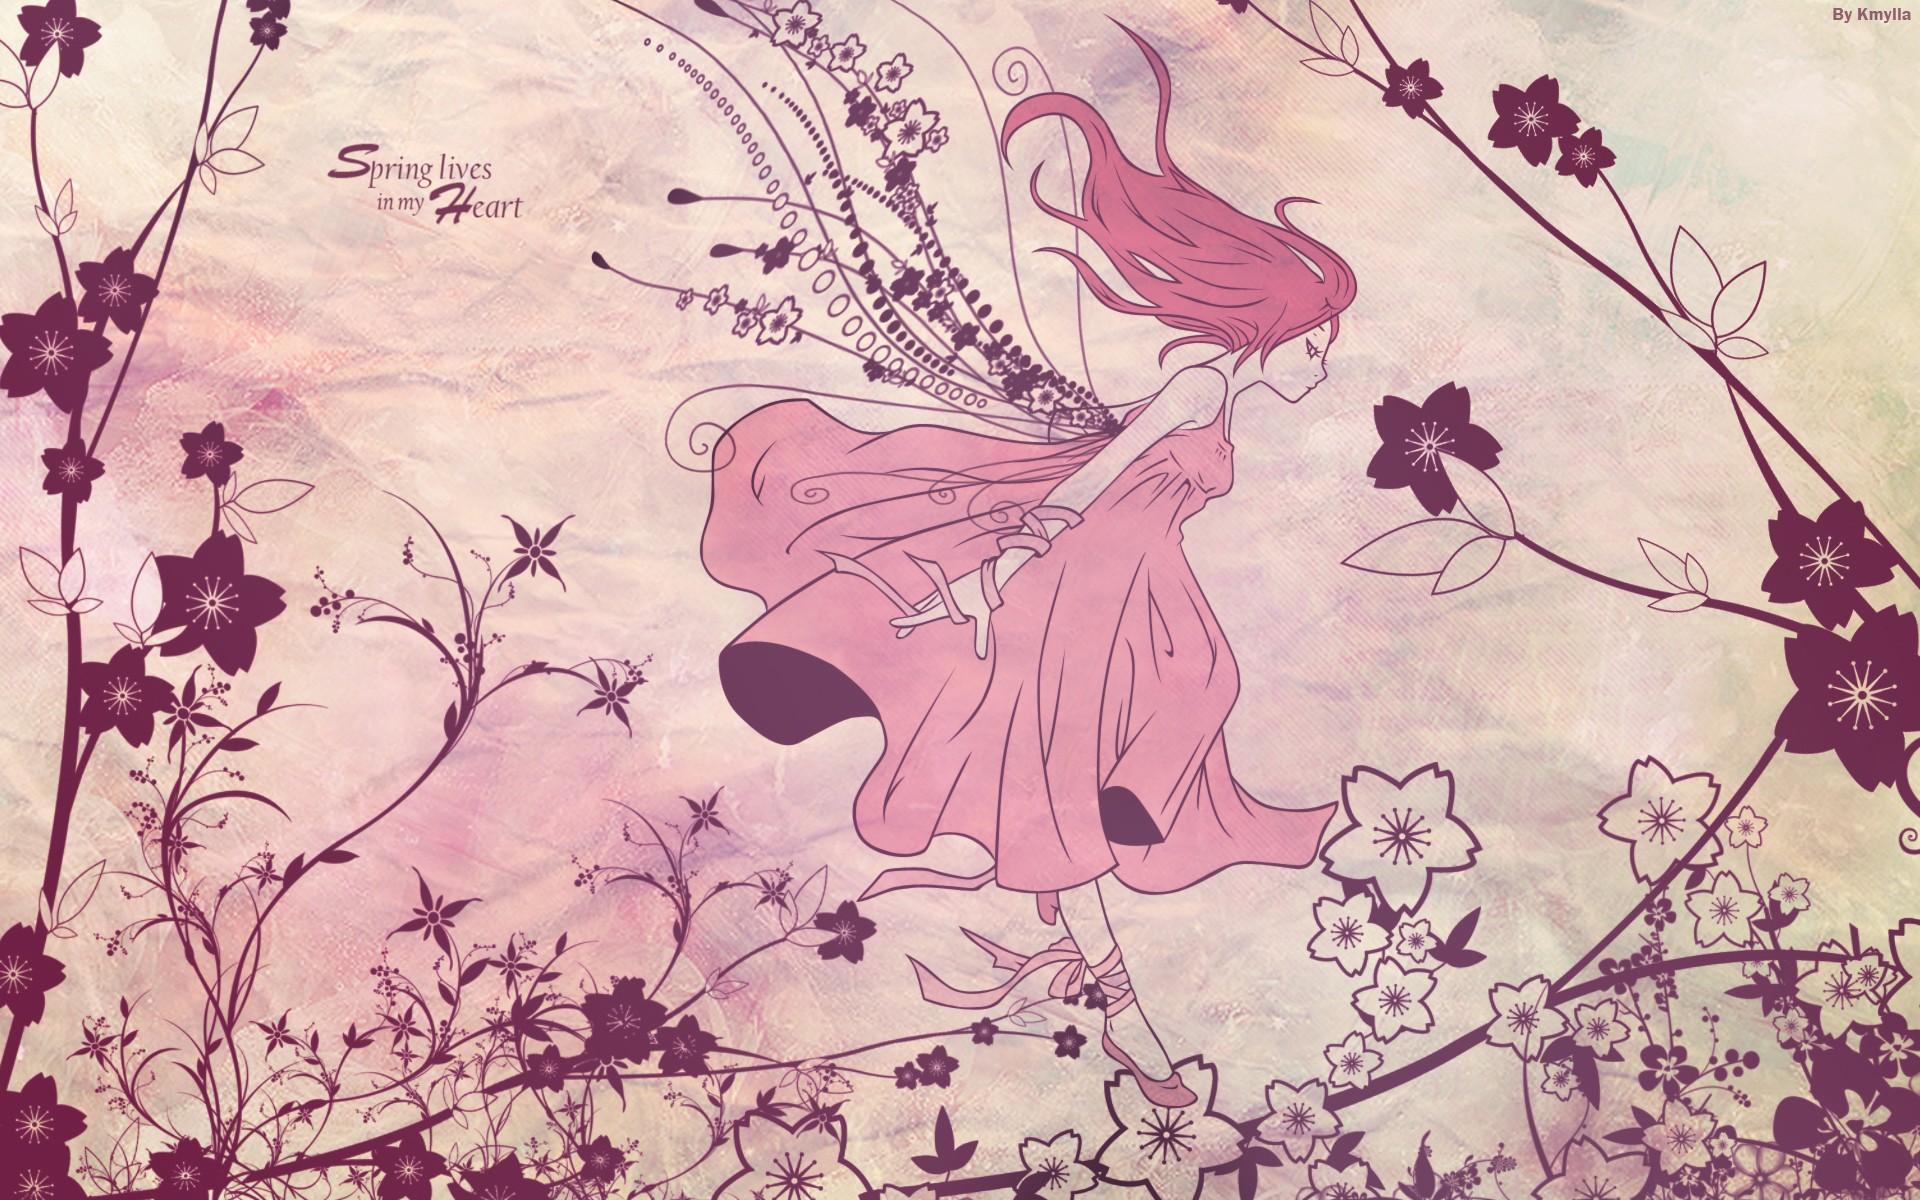 Free Download Spring Ballet Google Skins 1920x1200 For Your Desktop Mobile Tablet Explore 42 Pink Anime Wallpaper Cool Pink Wallpapers Pink Flowers Desktop Wallpaper Cool Anime Wallpapers Hd